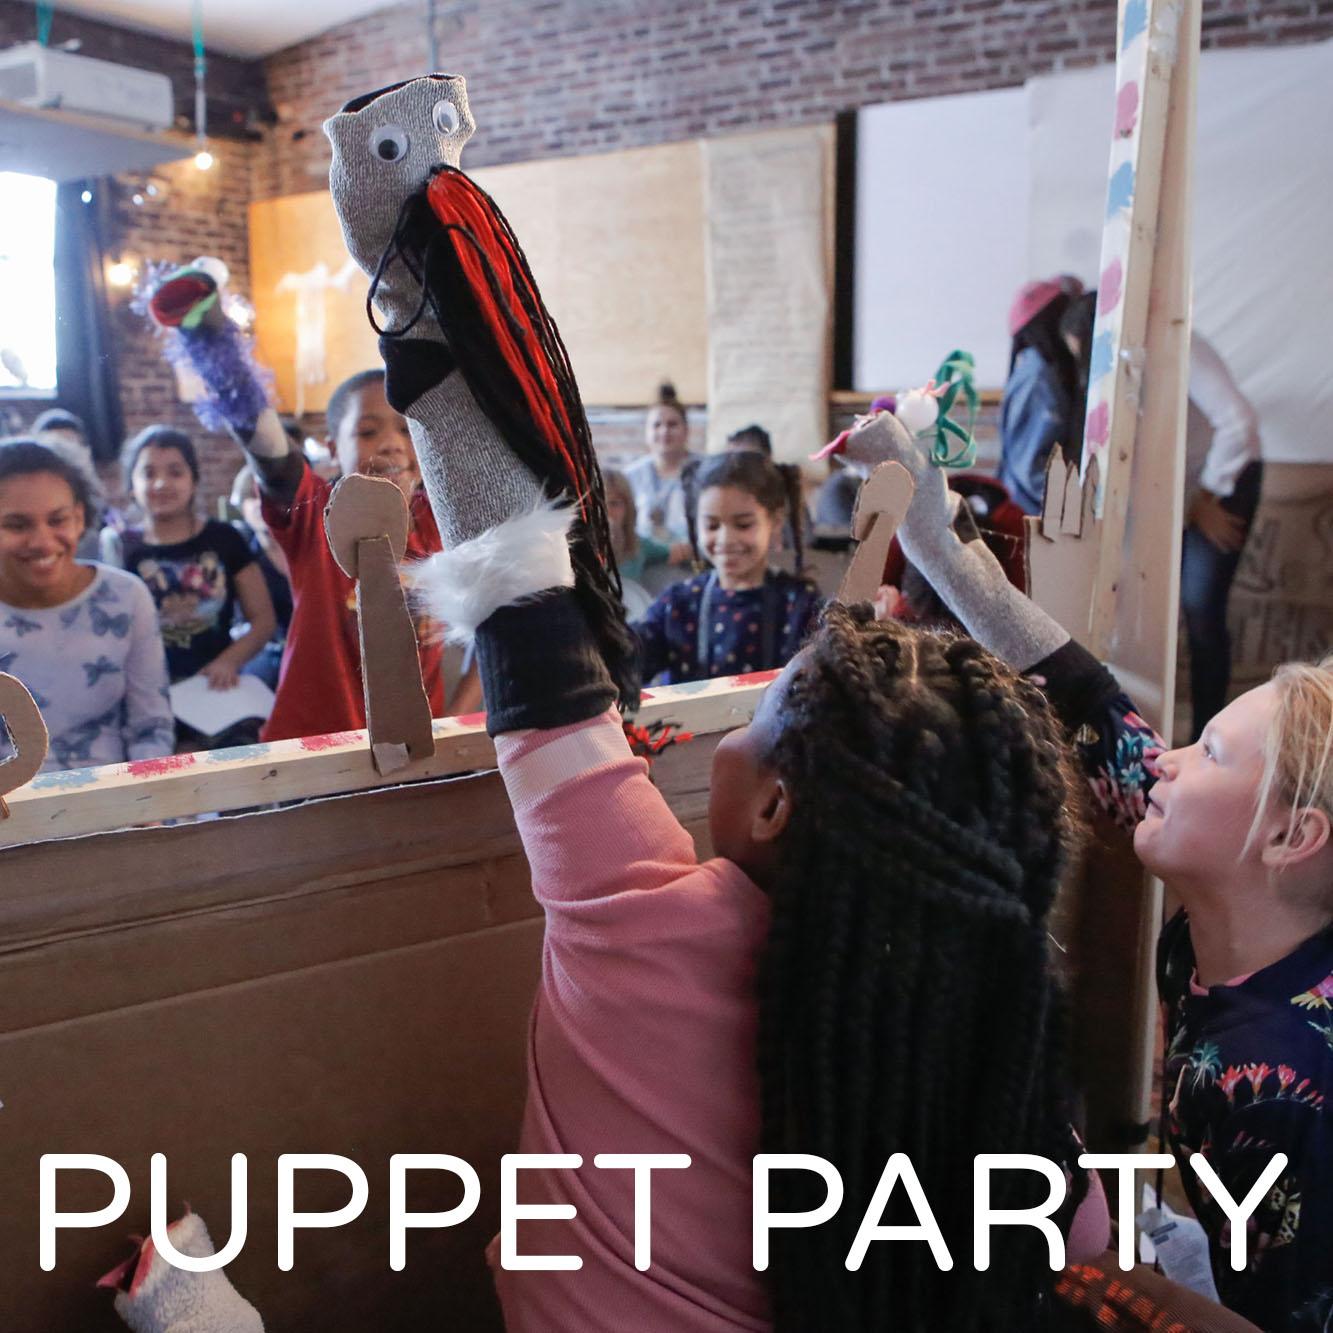 PuppetPartySquare6.jpg